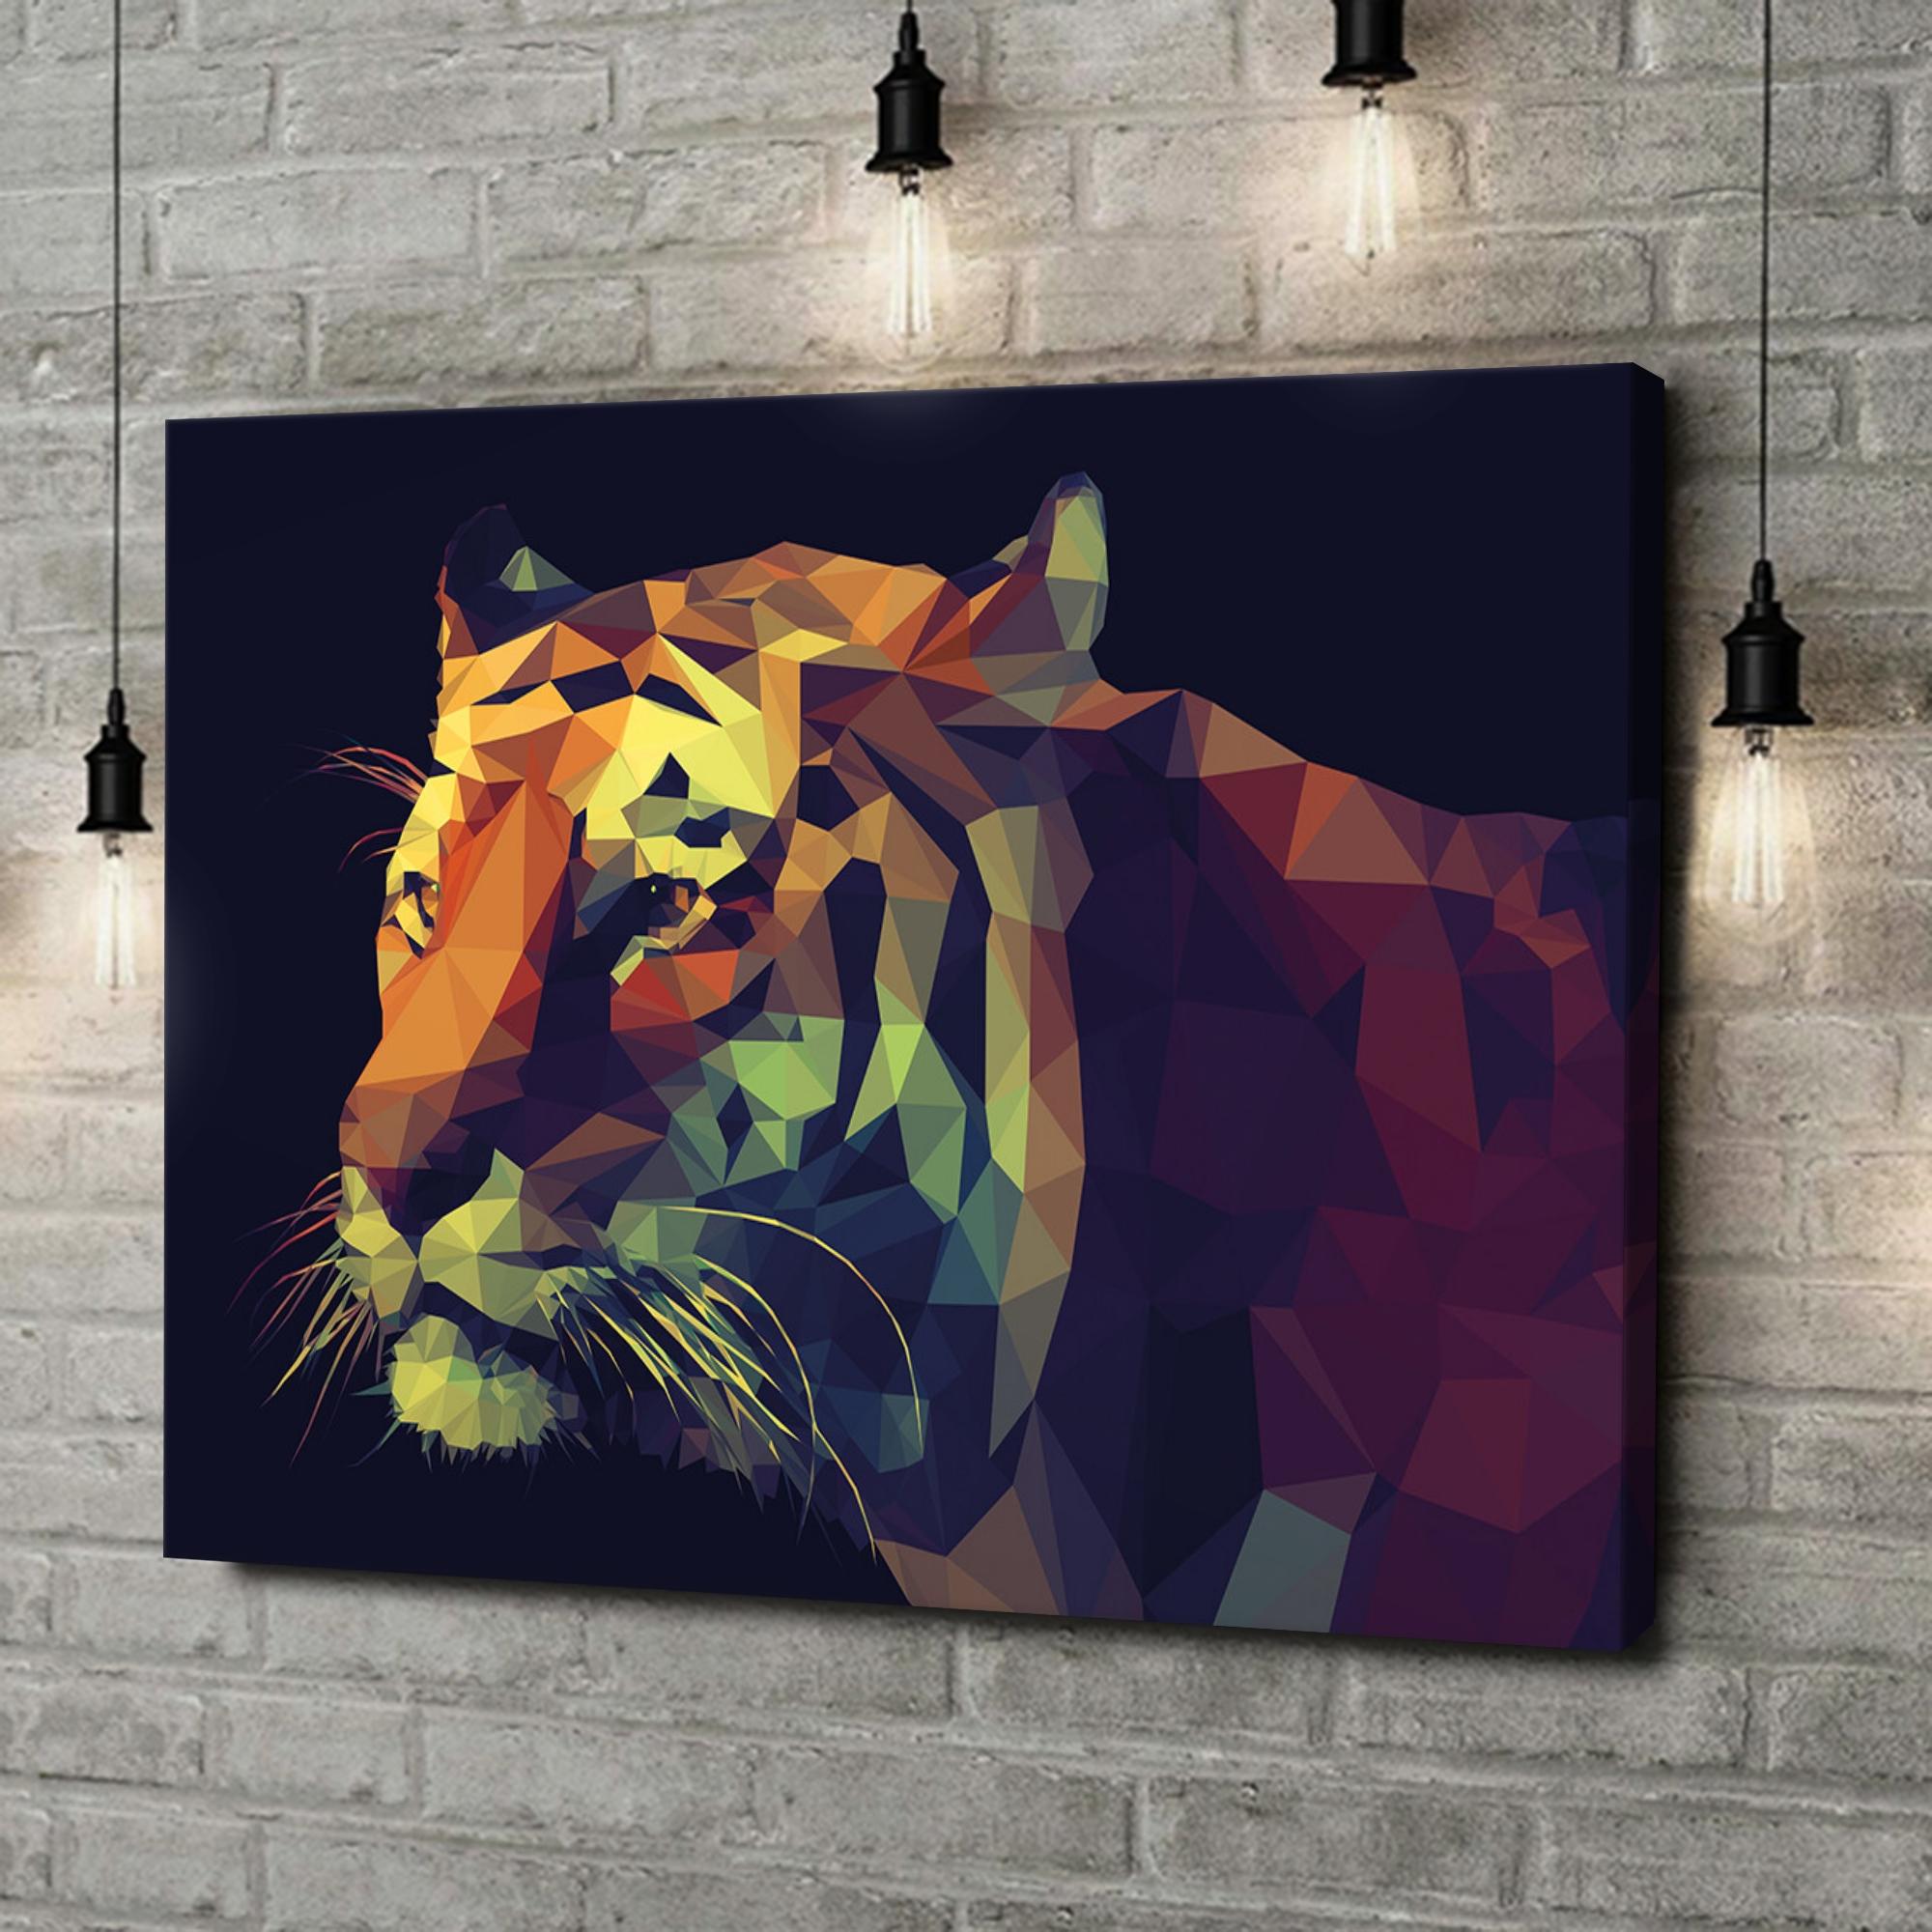 Leinwandbild personalisiert Tiger Polygon